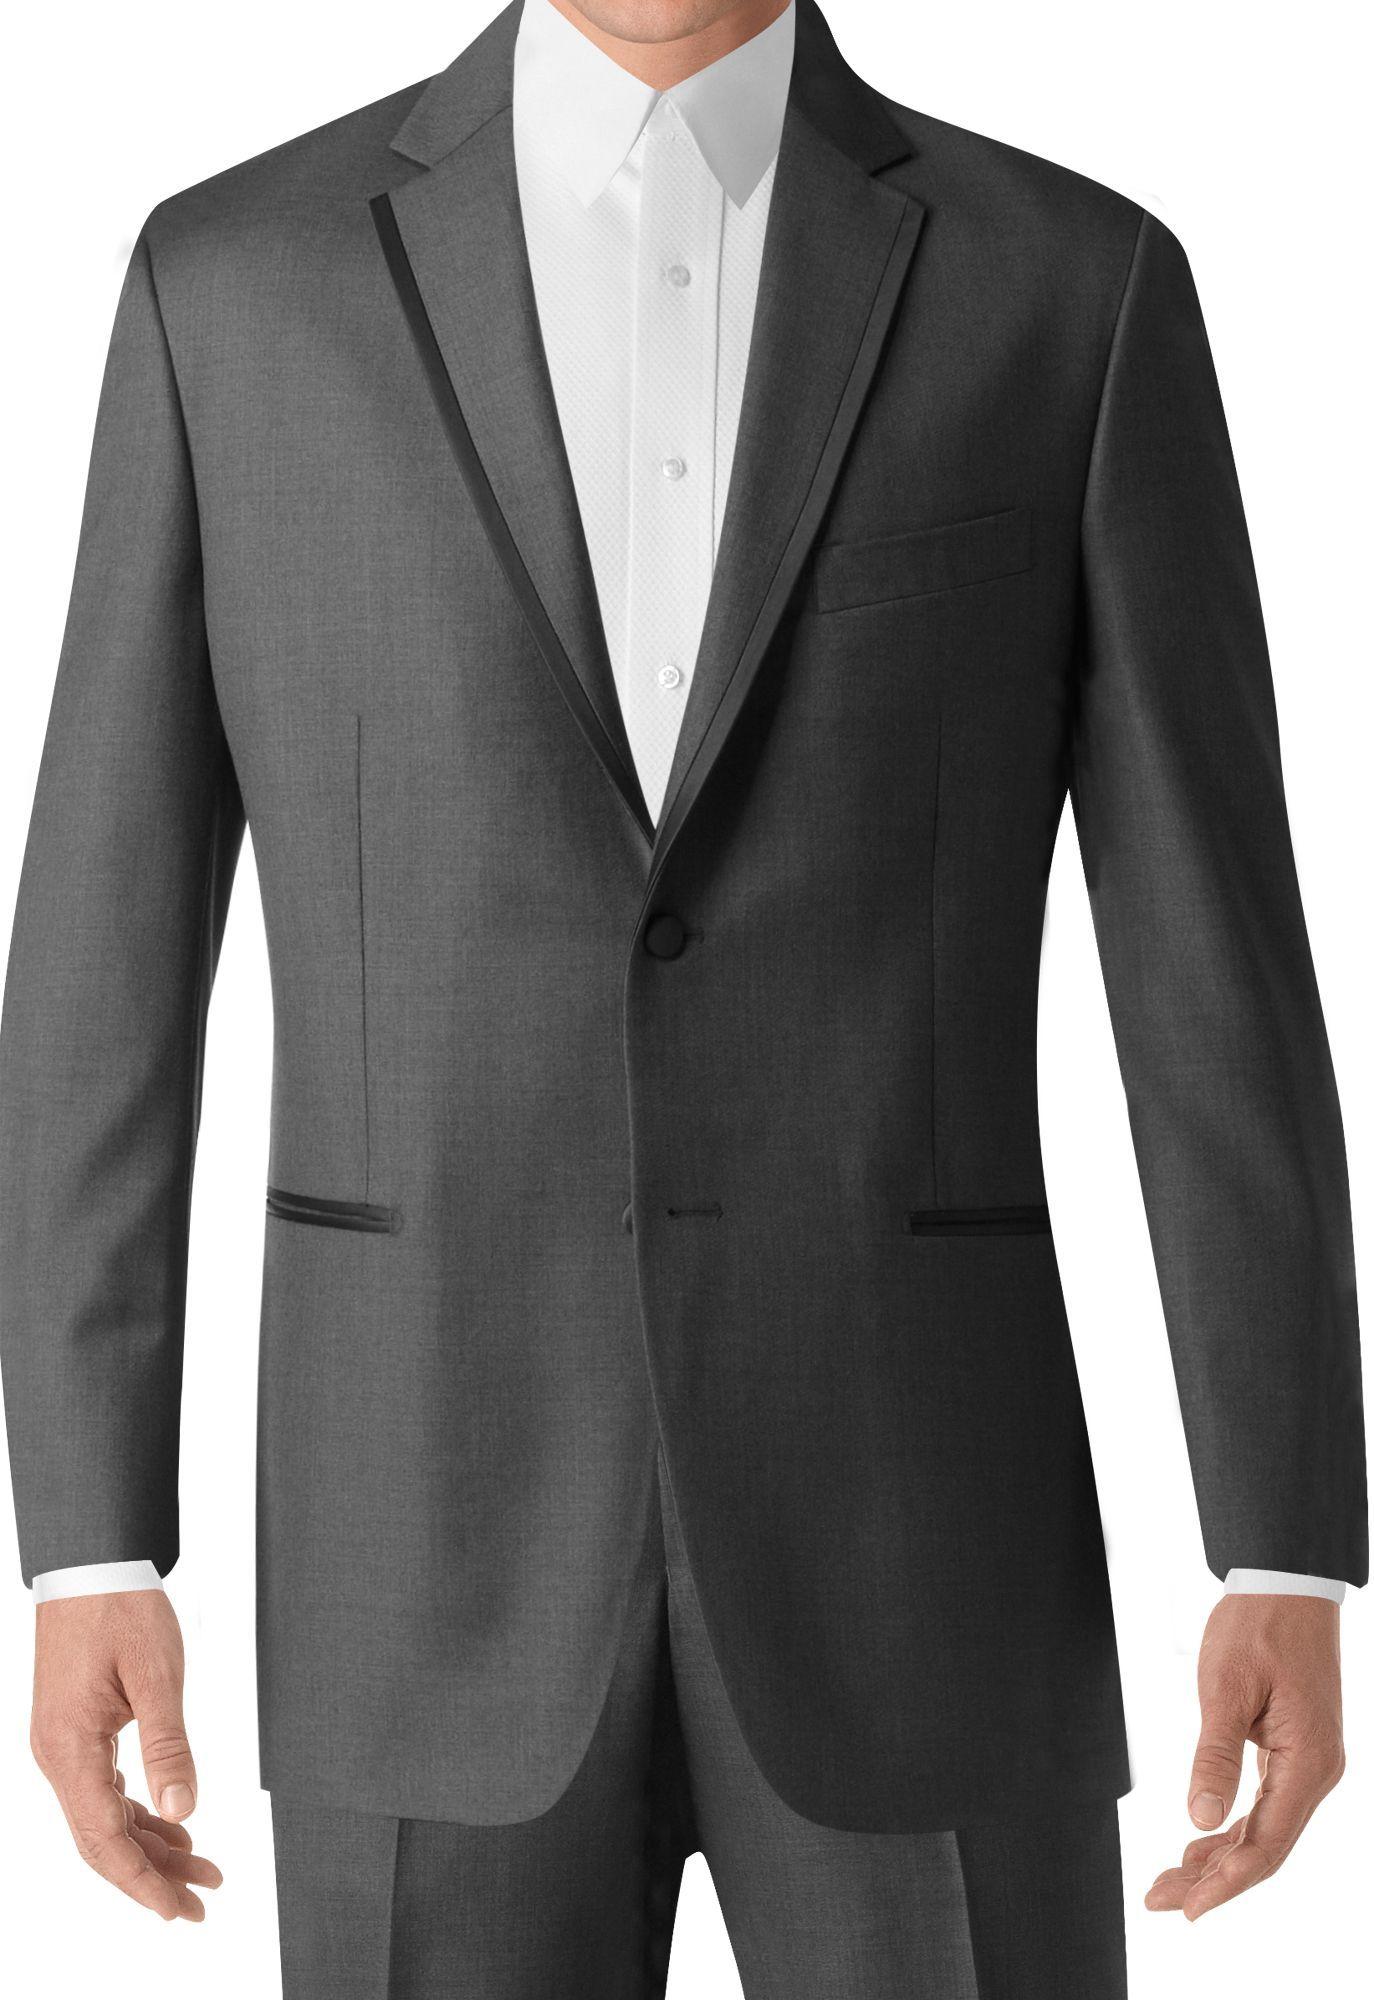 BLACK By Vera Wang Black Notch Lapel Tux Grey suit